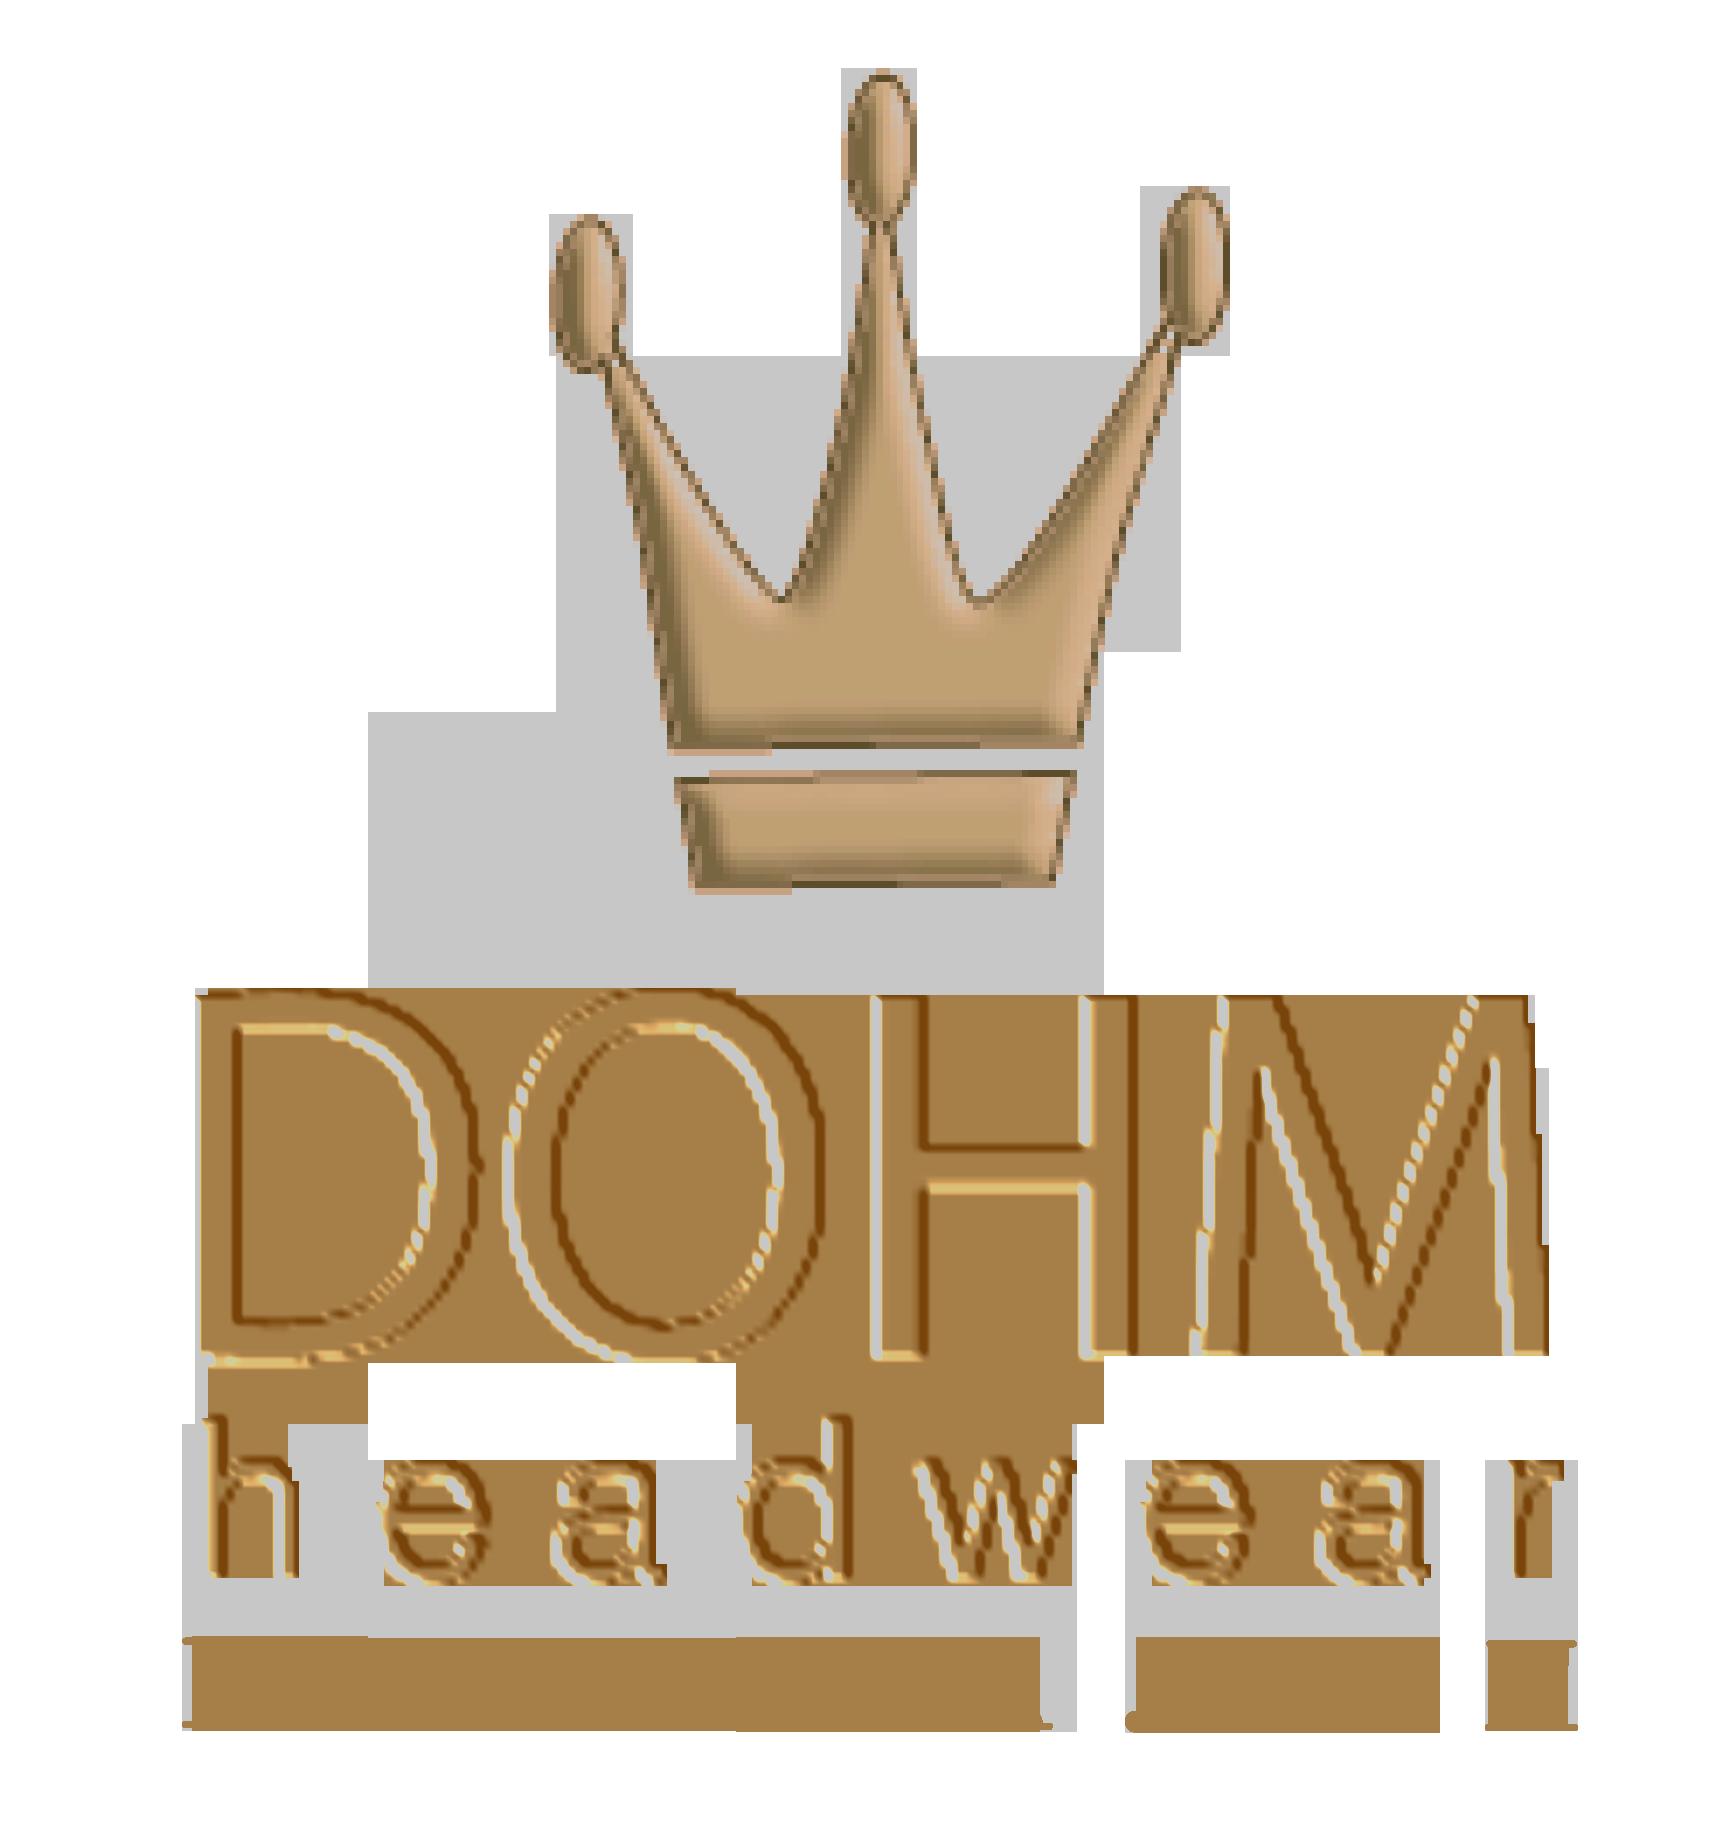 Dohm Usa, Hats made in USA